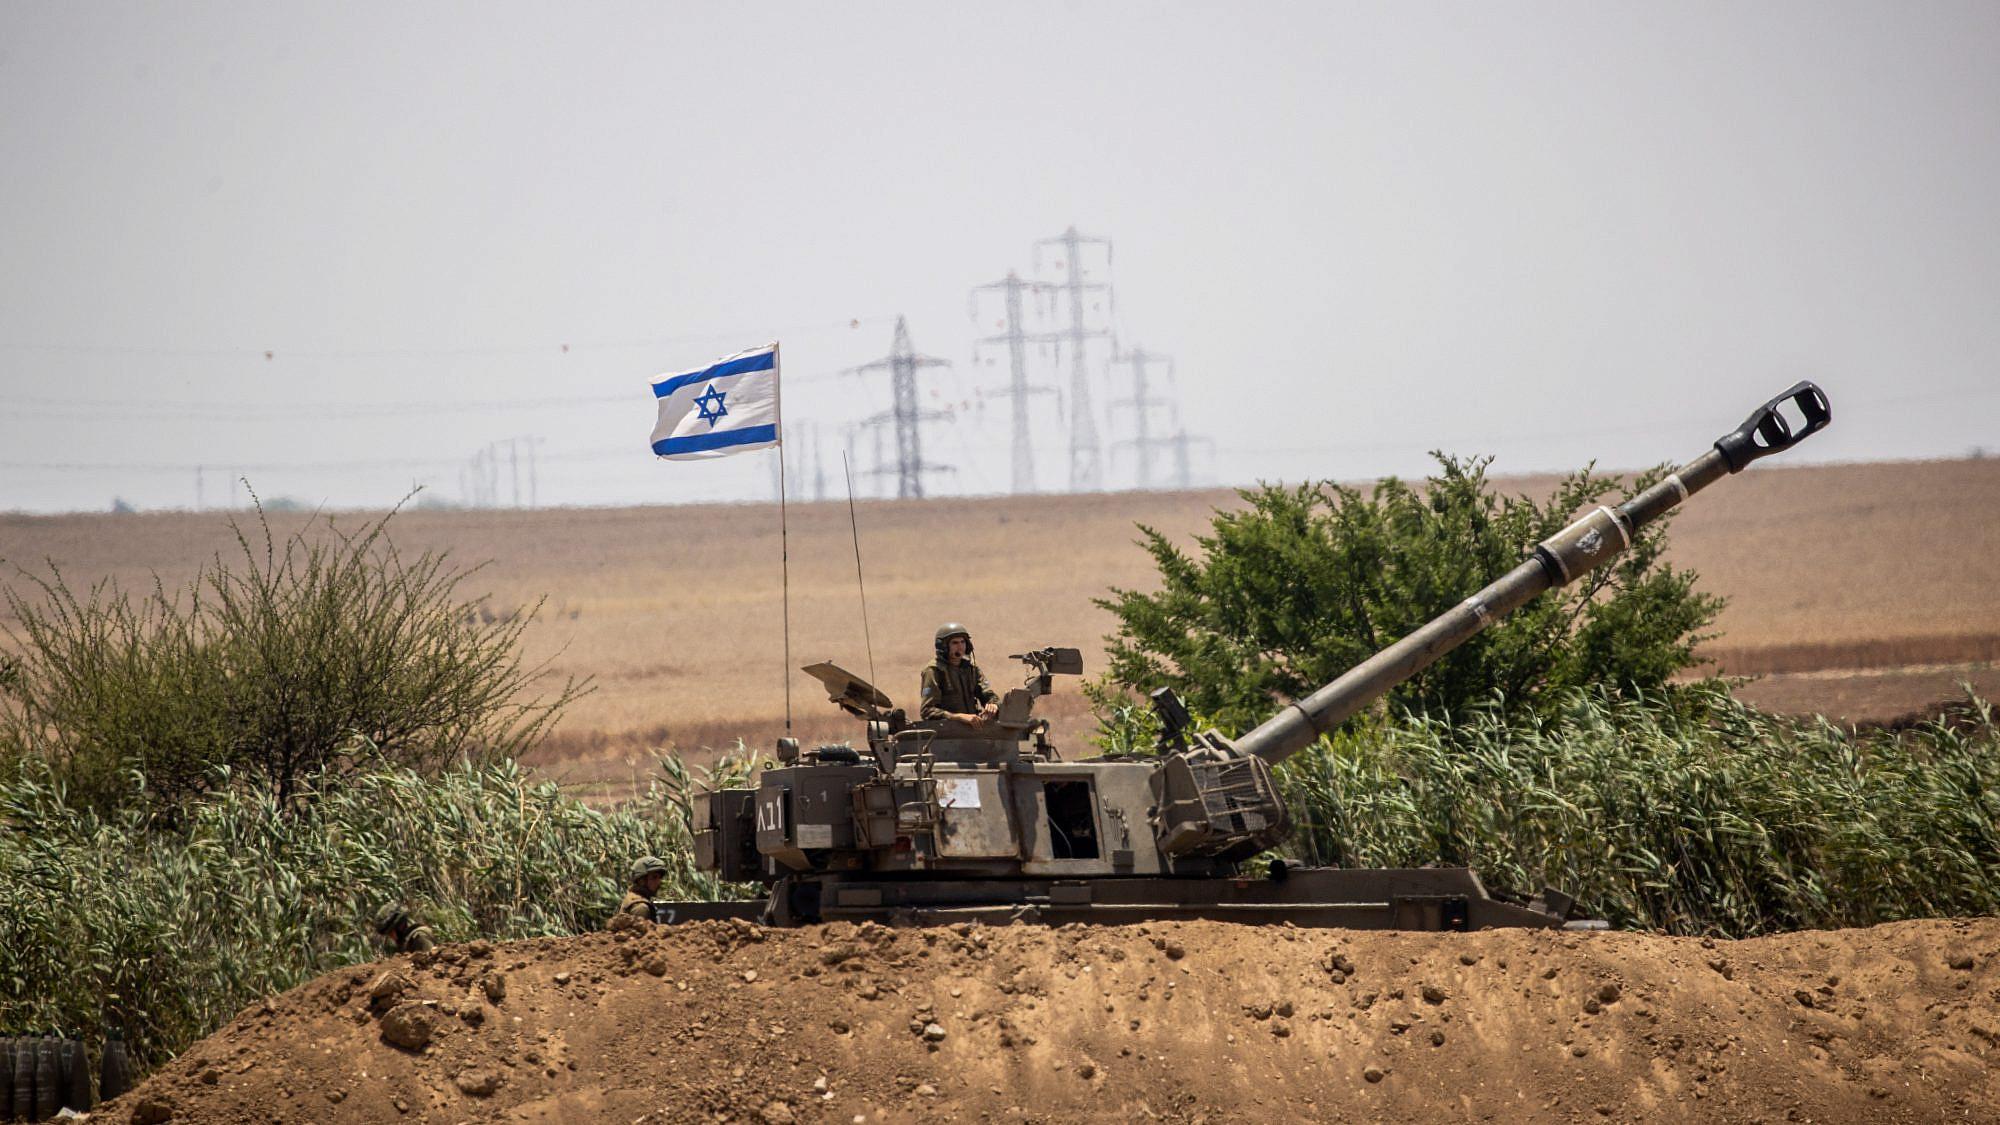 IDF (Israel Defense Force) Artillery Corps seen firing into Gaza, near the Israeli border with Gaza on May 20, 2021. Photo by Yonatan Sindel/Flash90